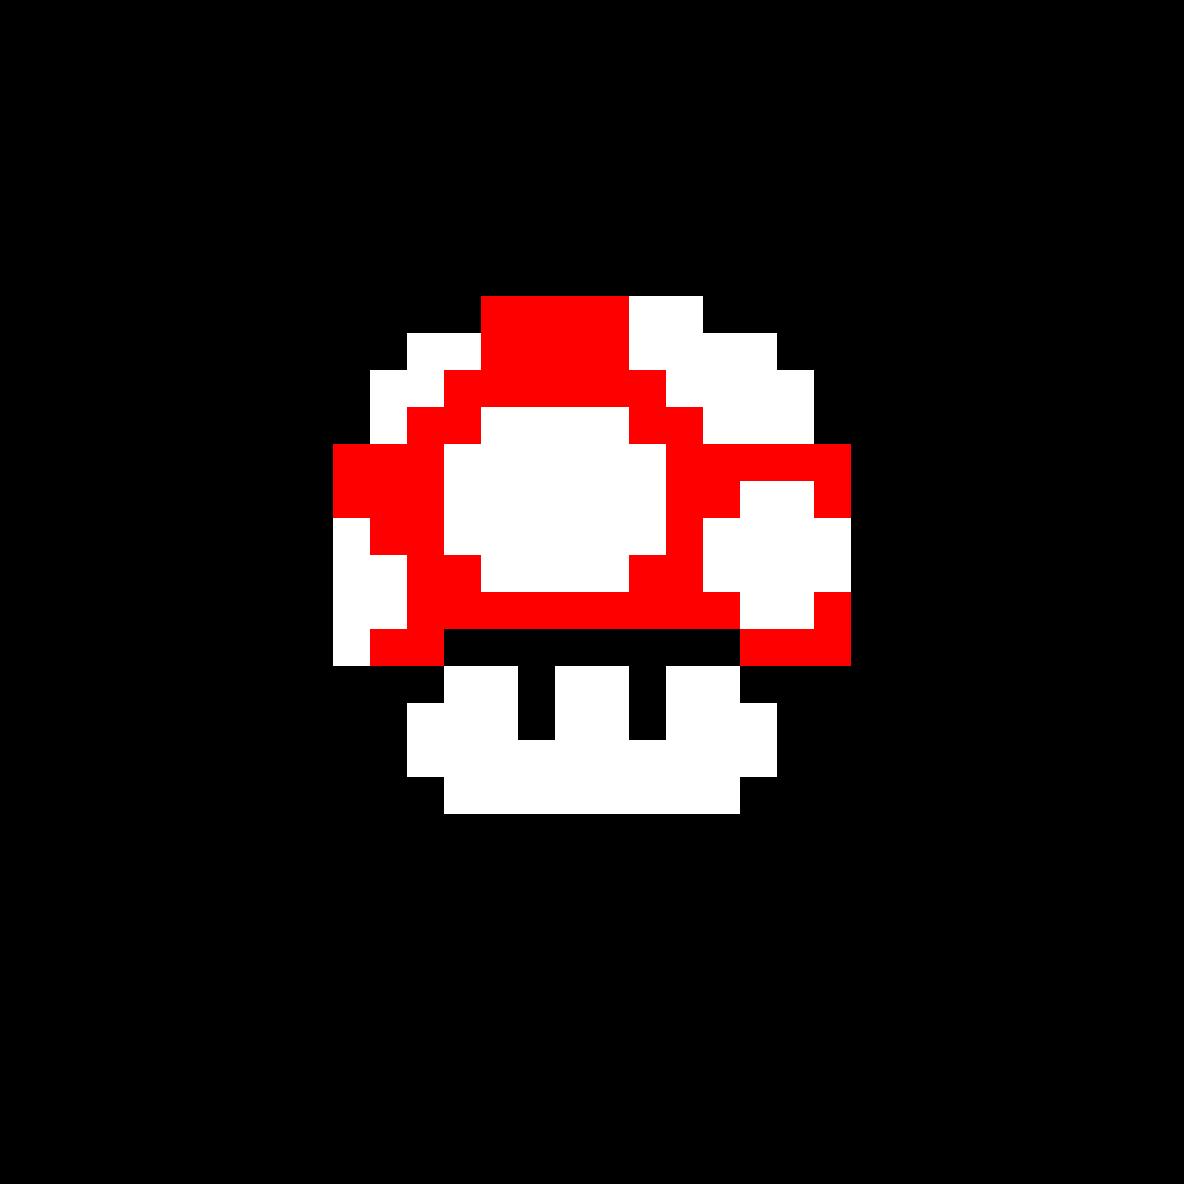 Super Mario Bros Red Mushroom by Insano